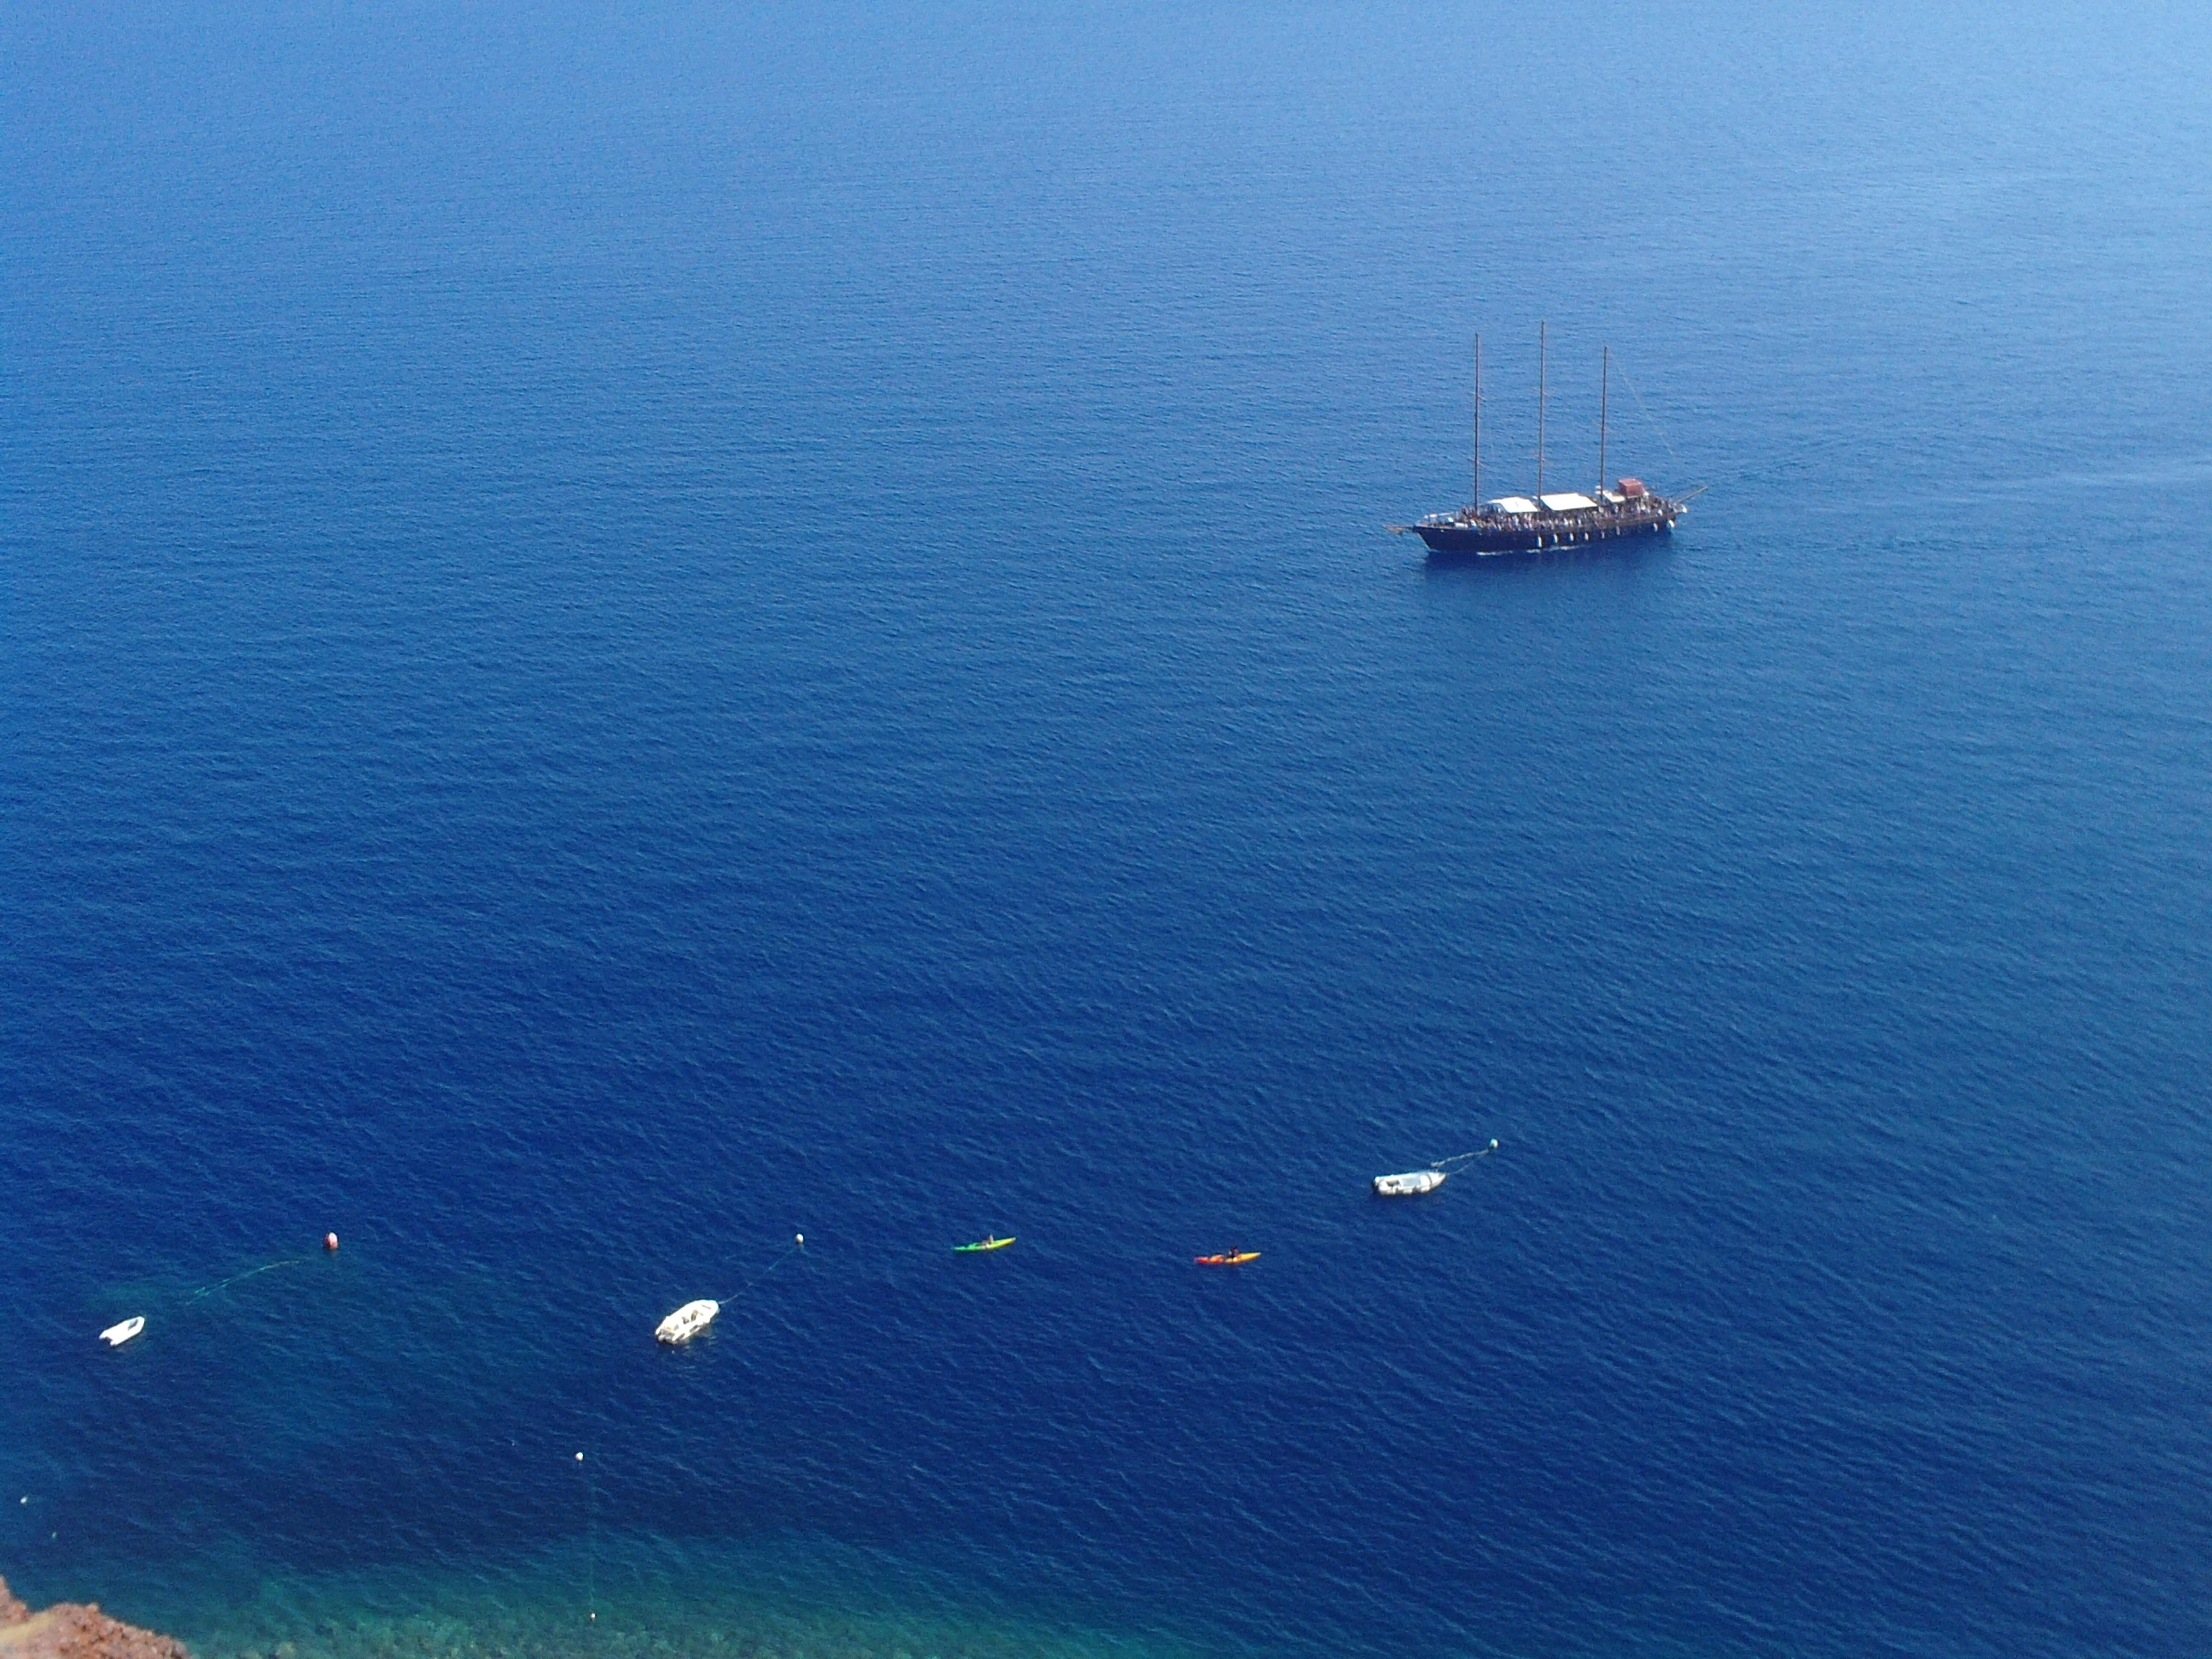 16. Sea view from the donkey path - Oia, Santorini